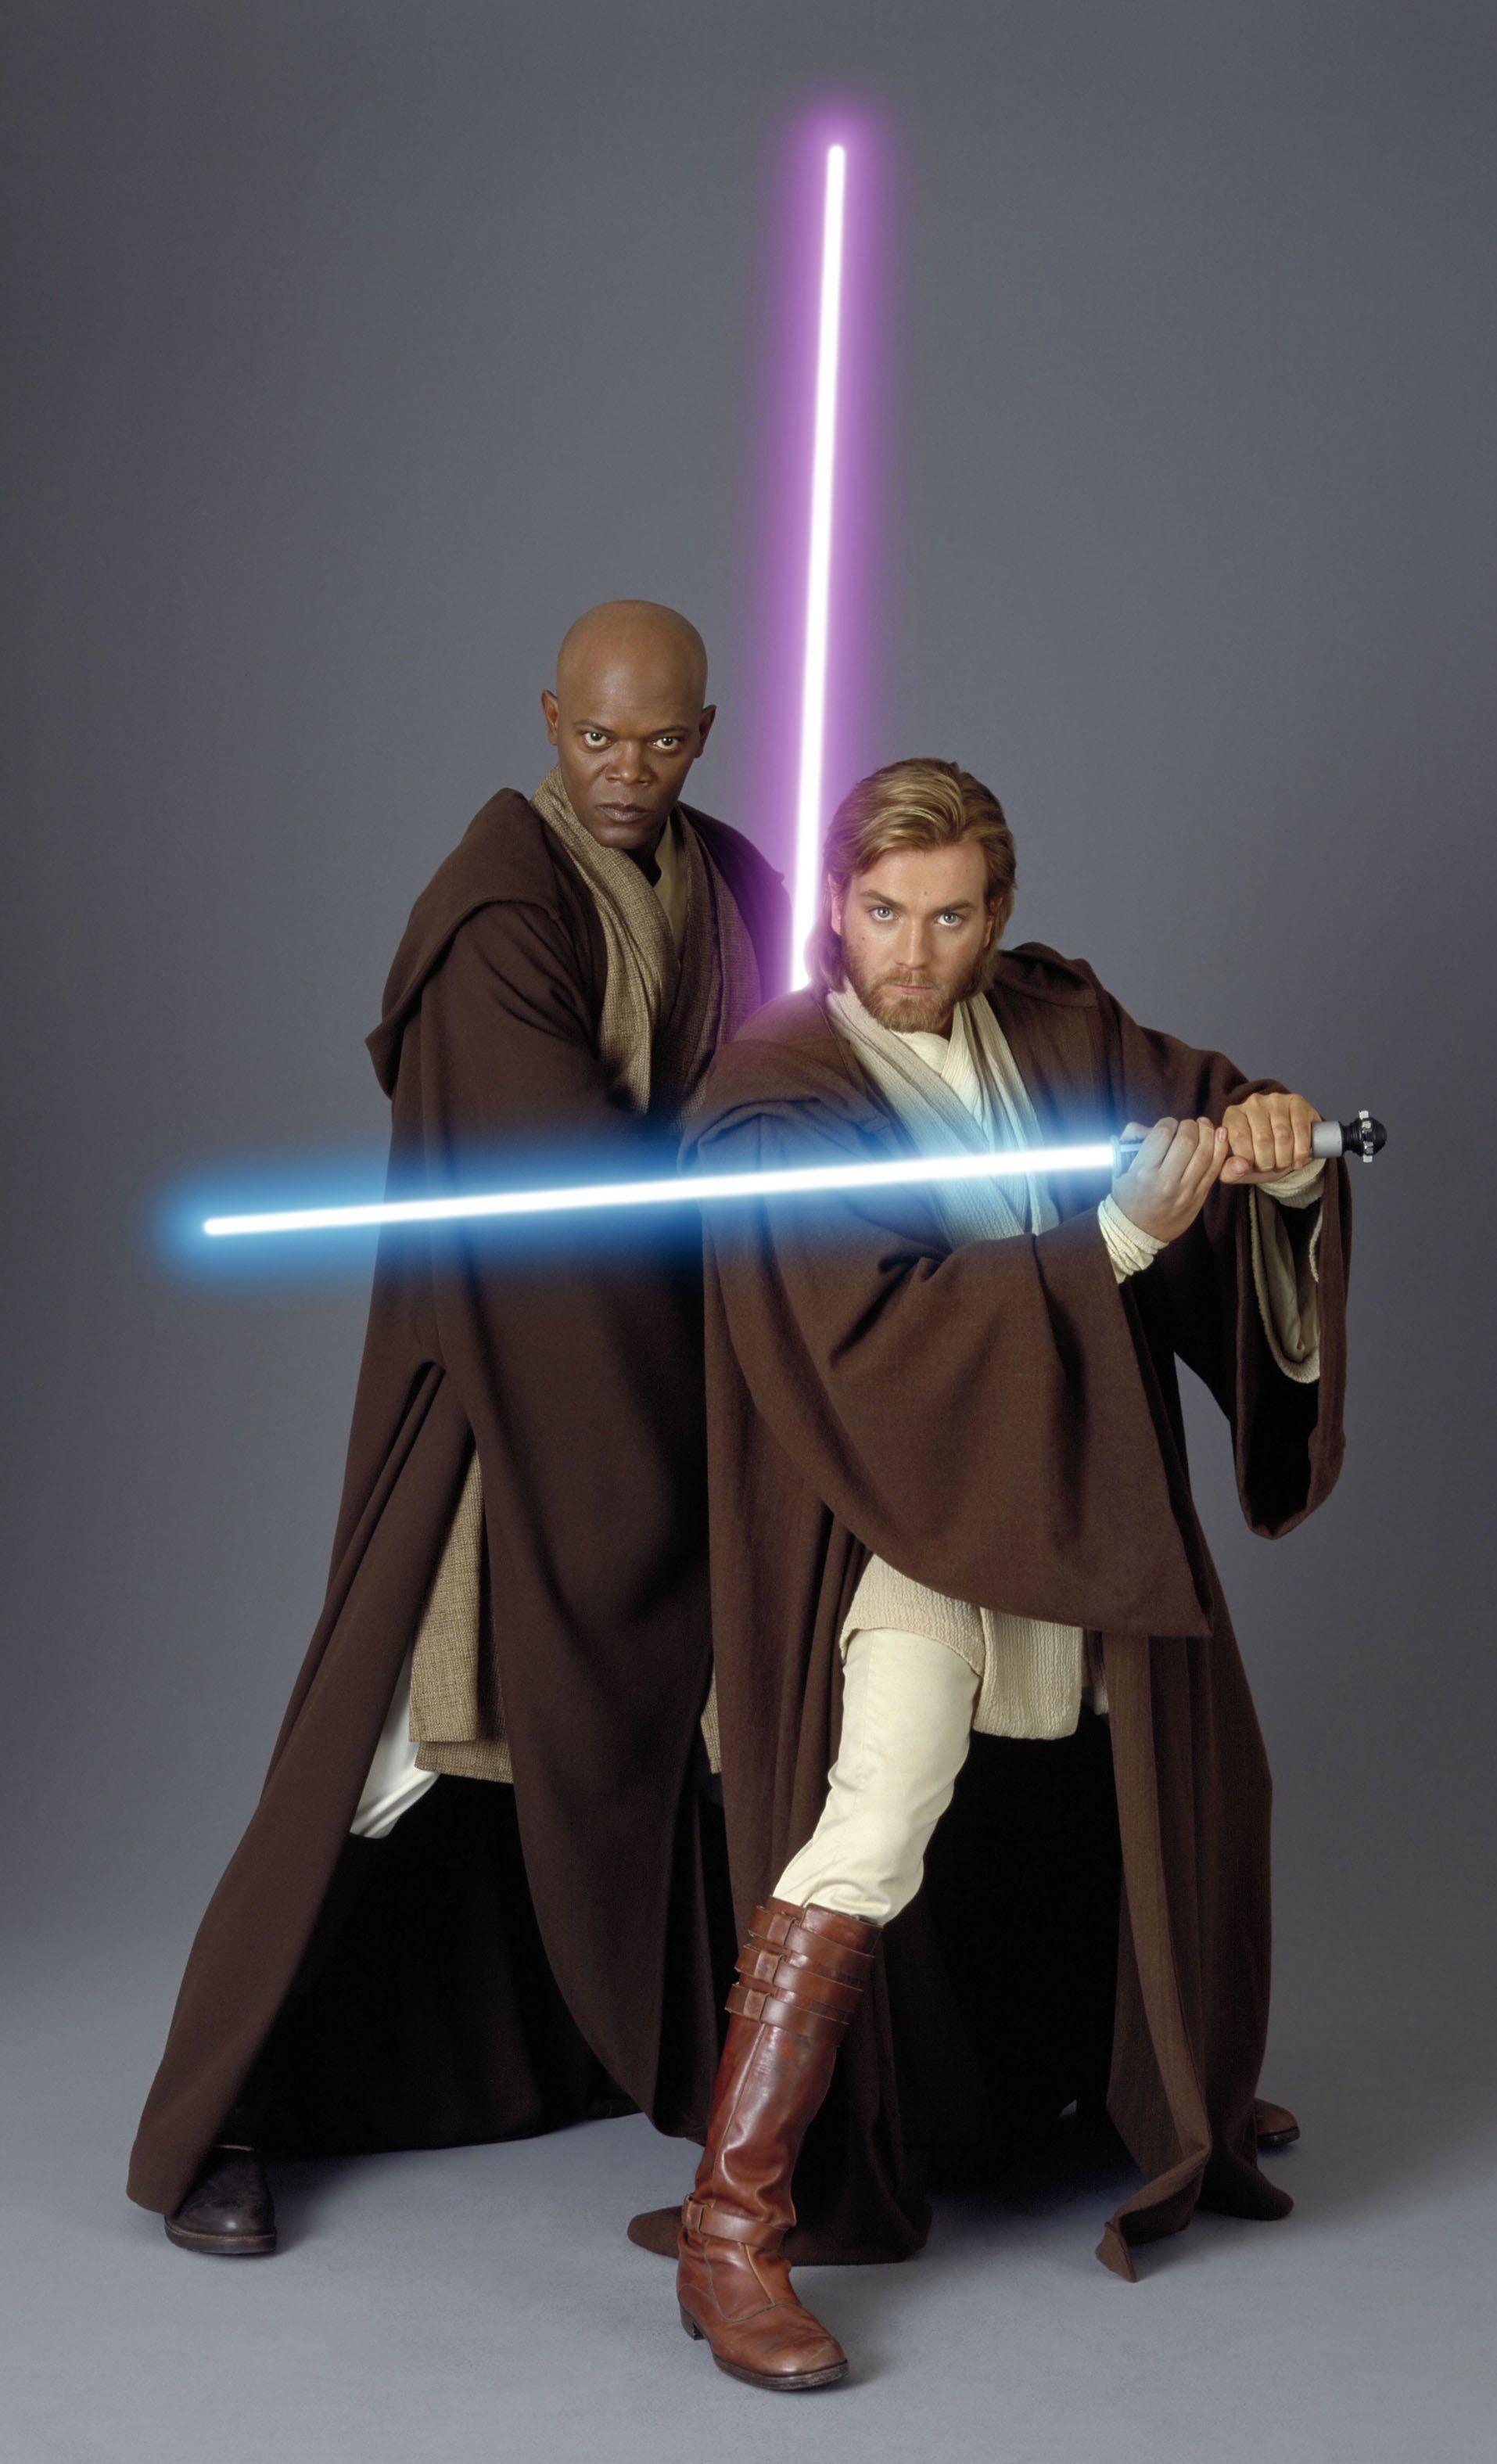 Obi-Wan Kenobi and Mace Windu | Star Wars | Pinterest